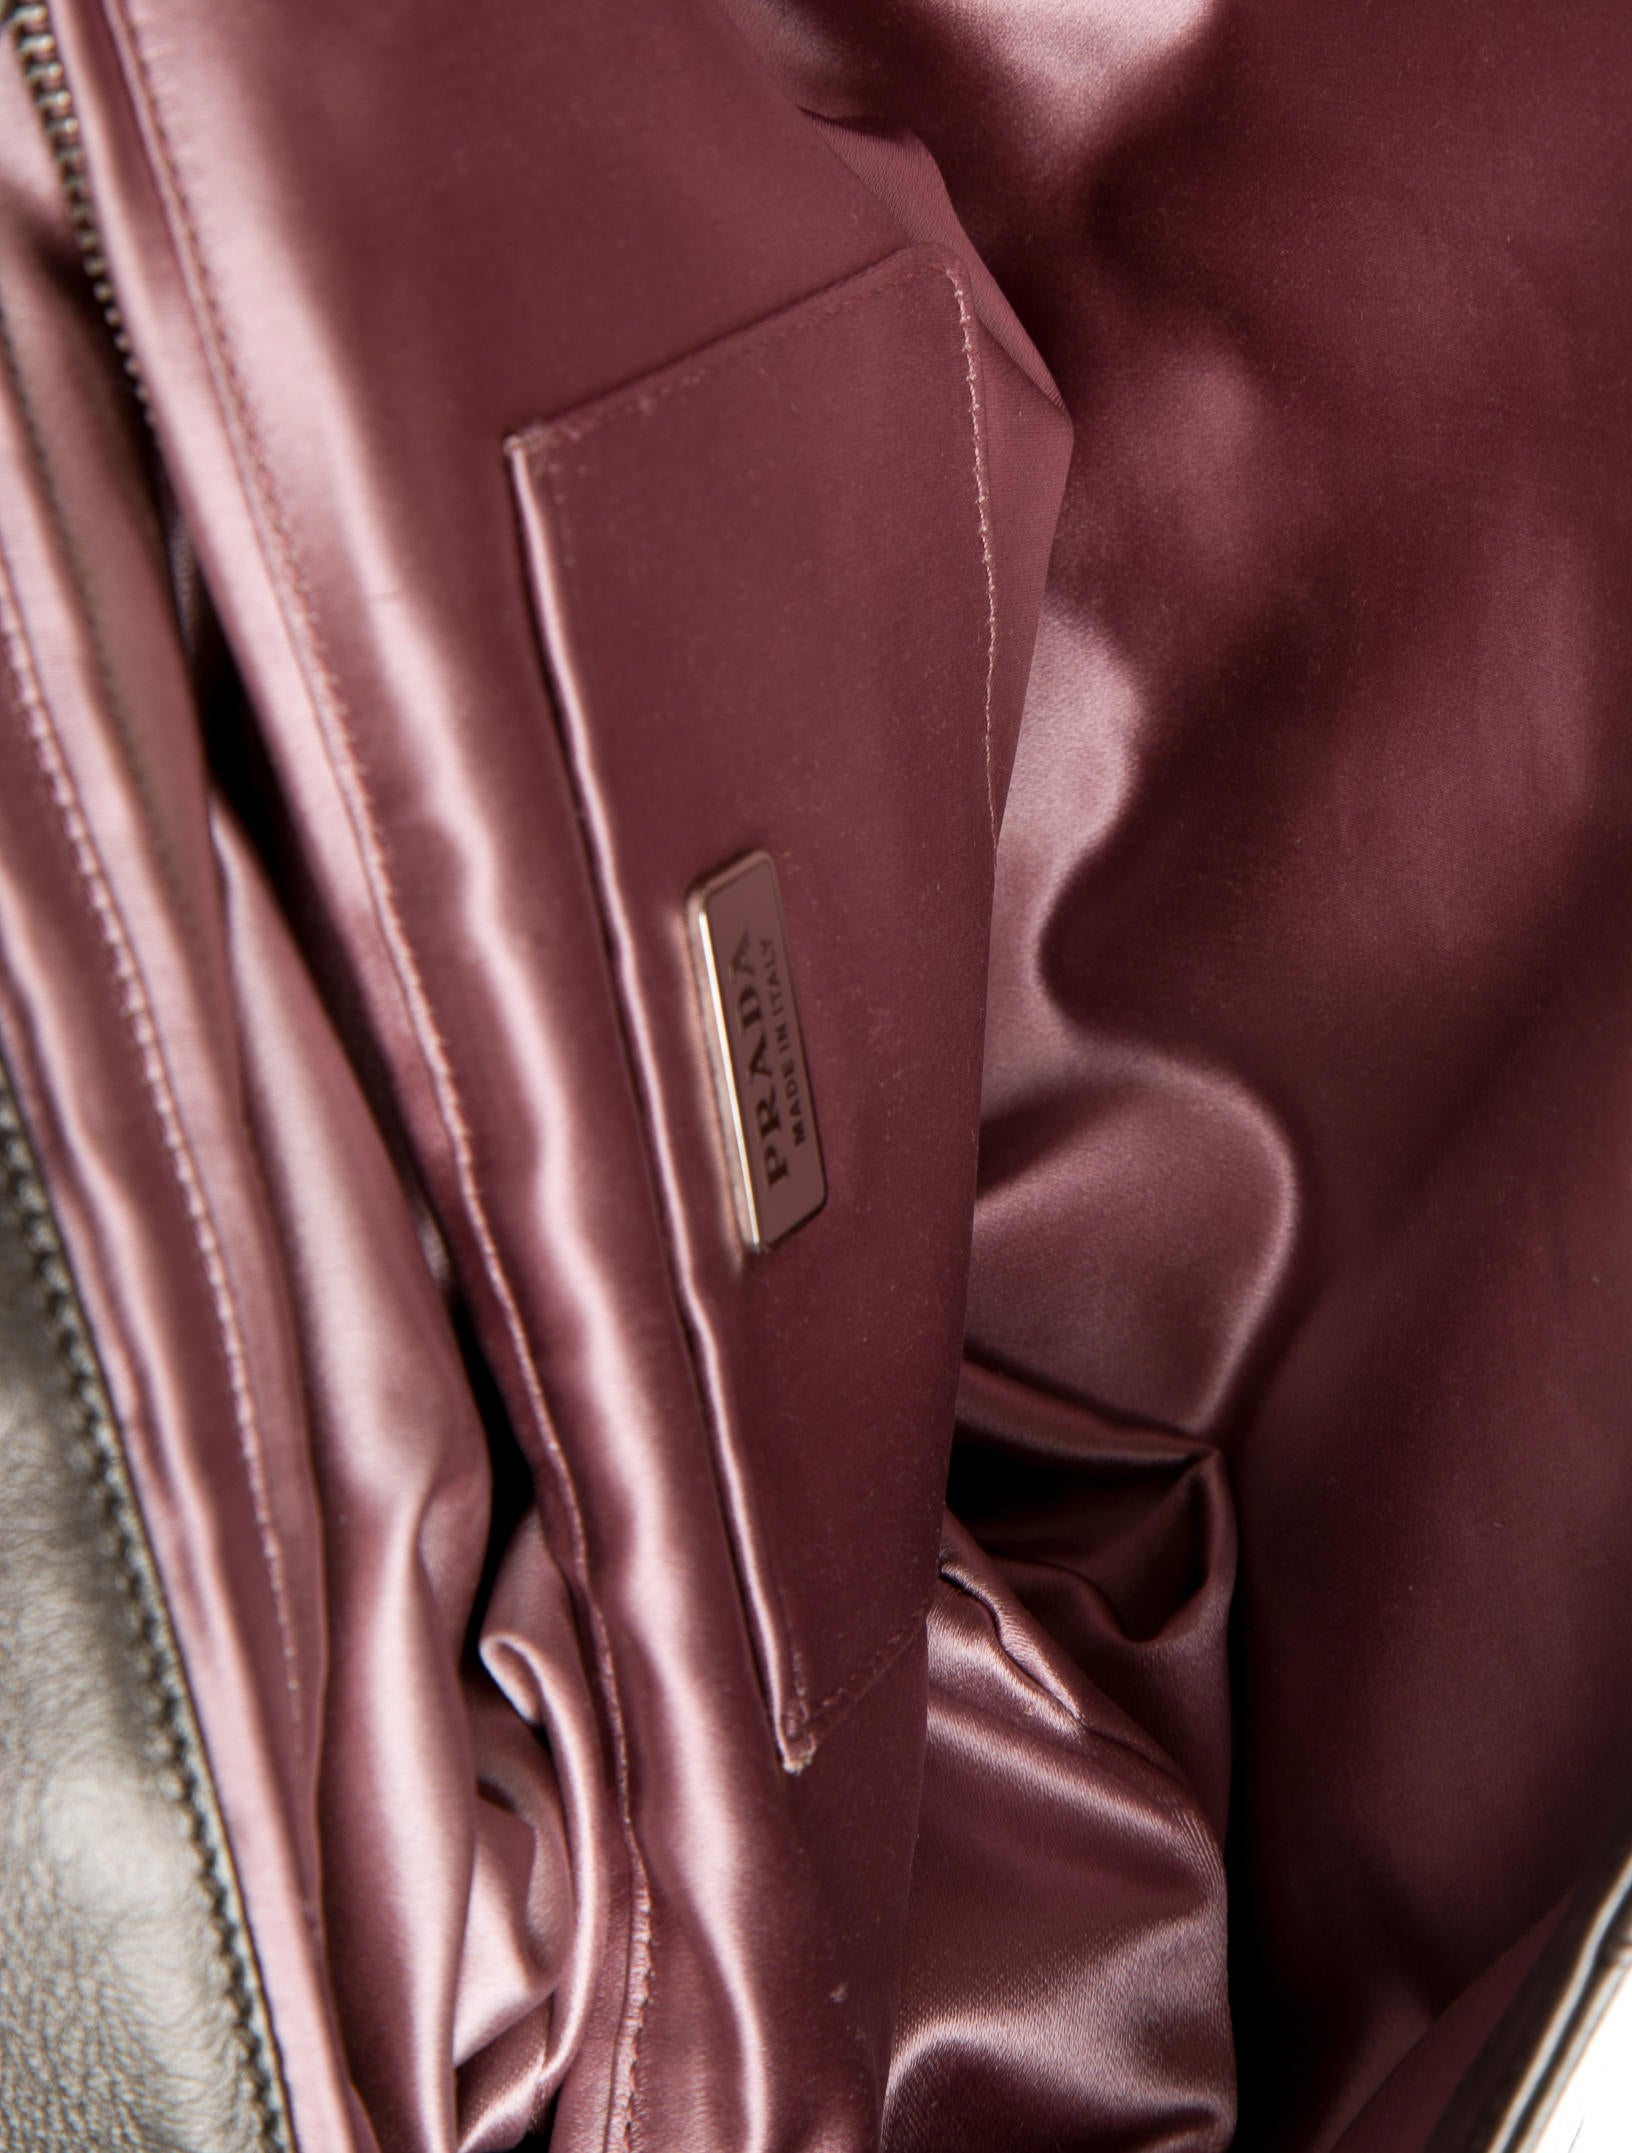 prada inspired bag - Prada Nappa Stripes Large Clutch - Handbags - PRA83445 | The RealReal